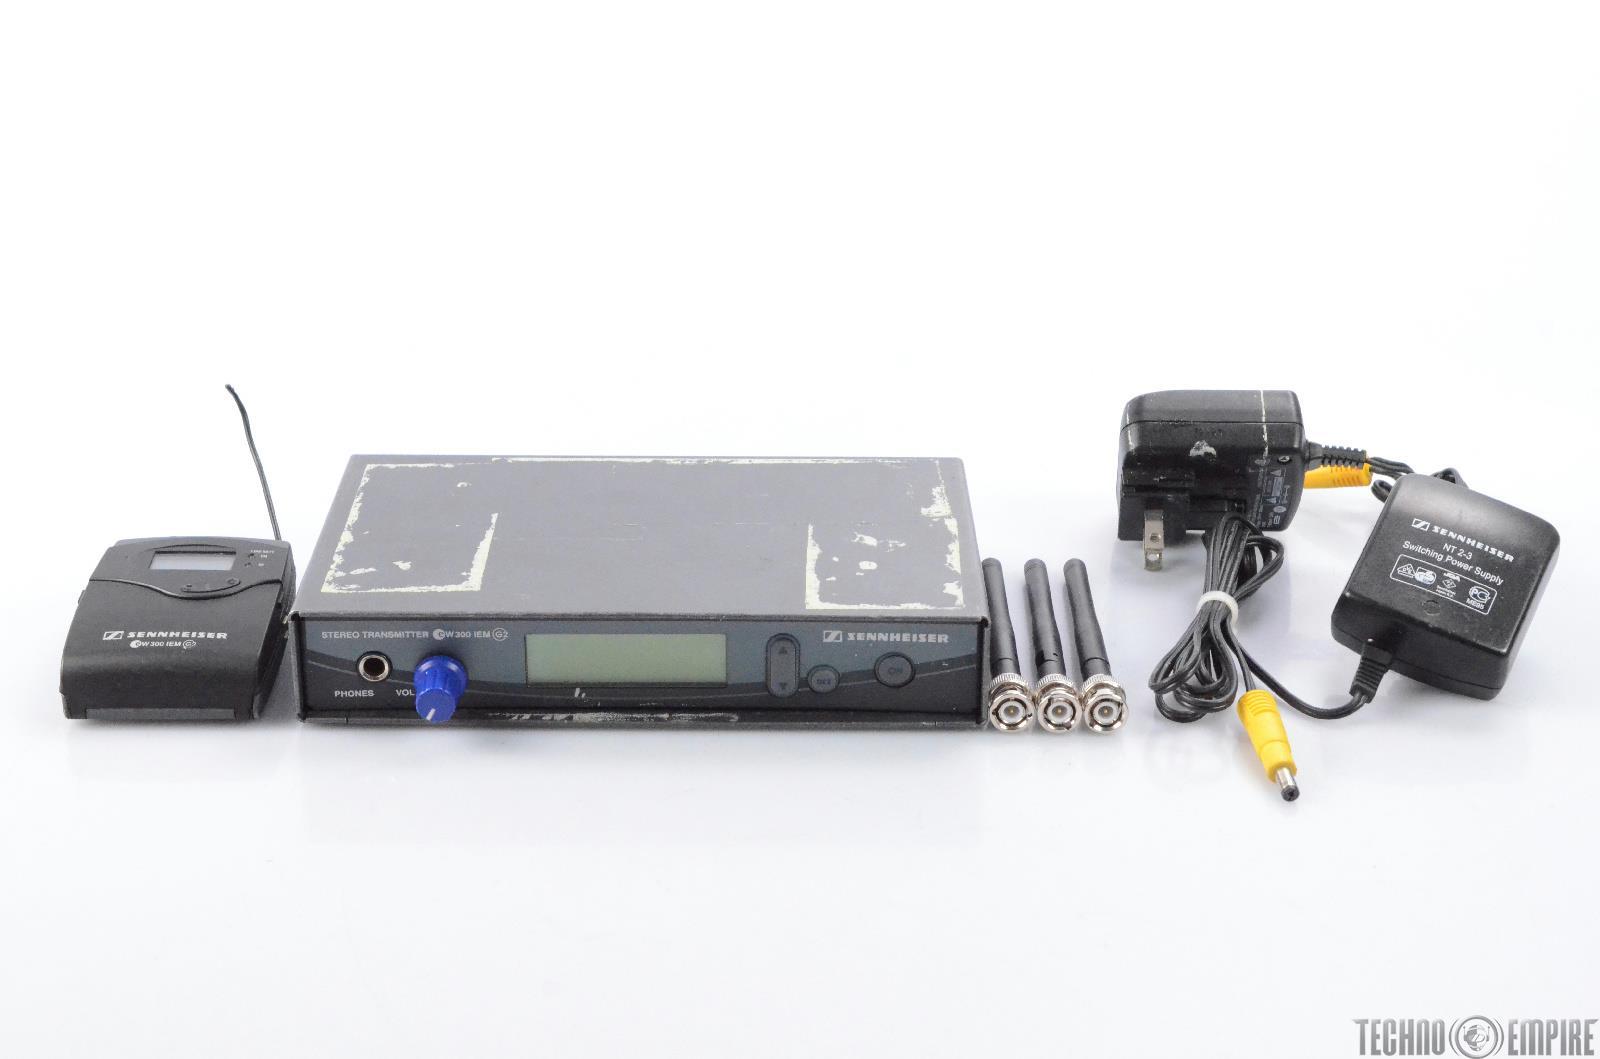 Sennheiser EW 300 IEM G2 Wireless System Reciever & Transmitter #28316